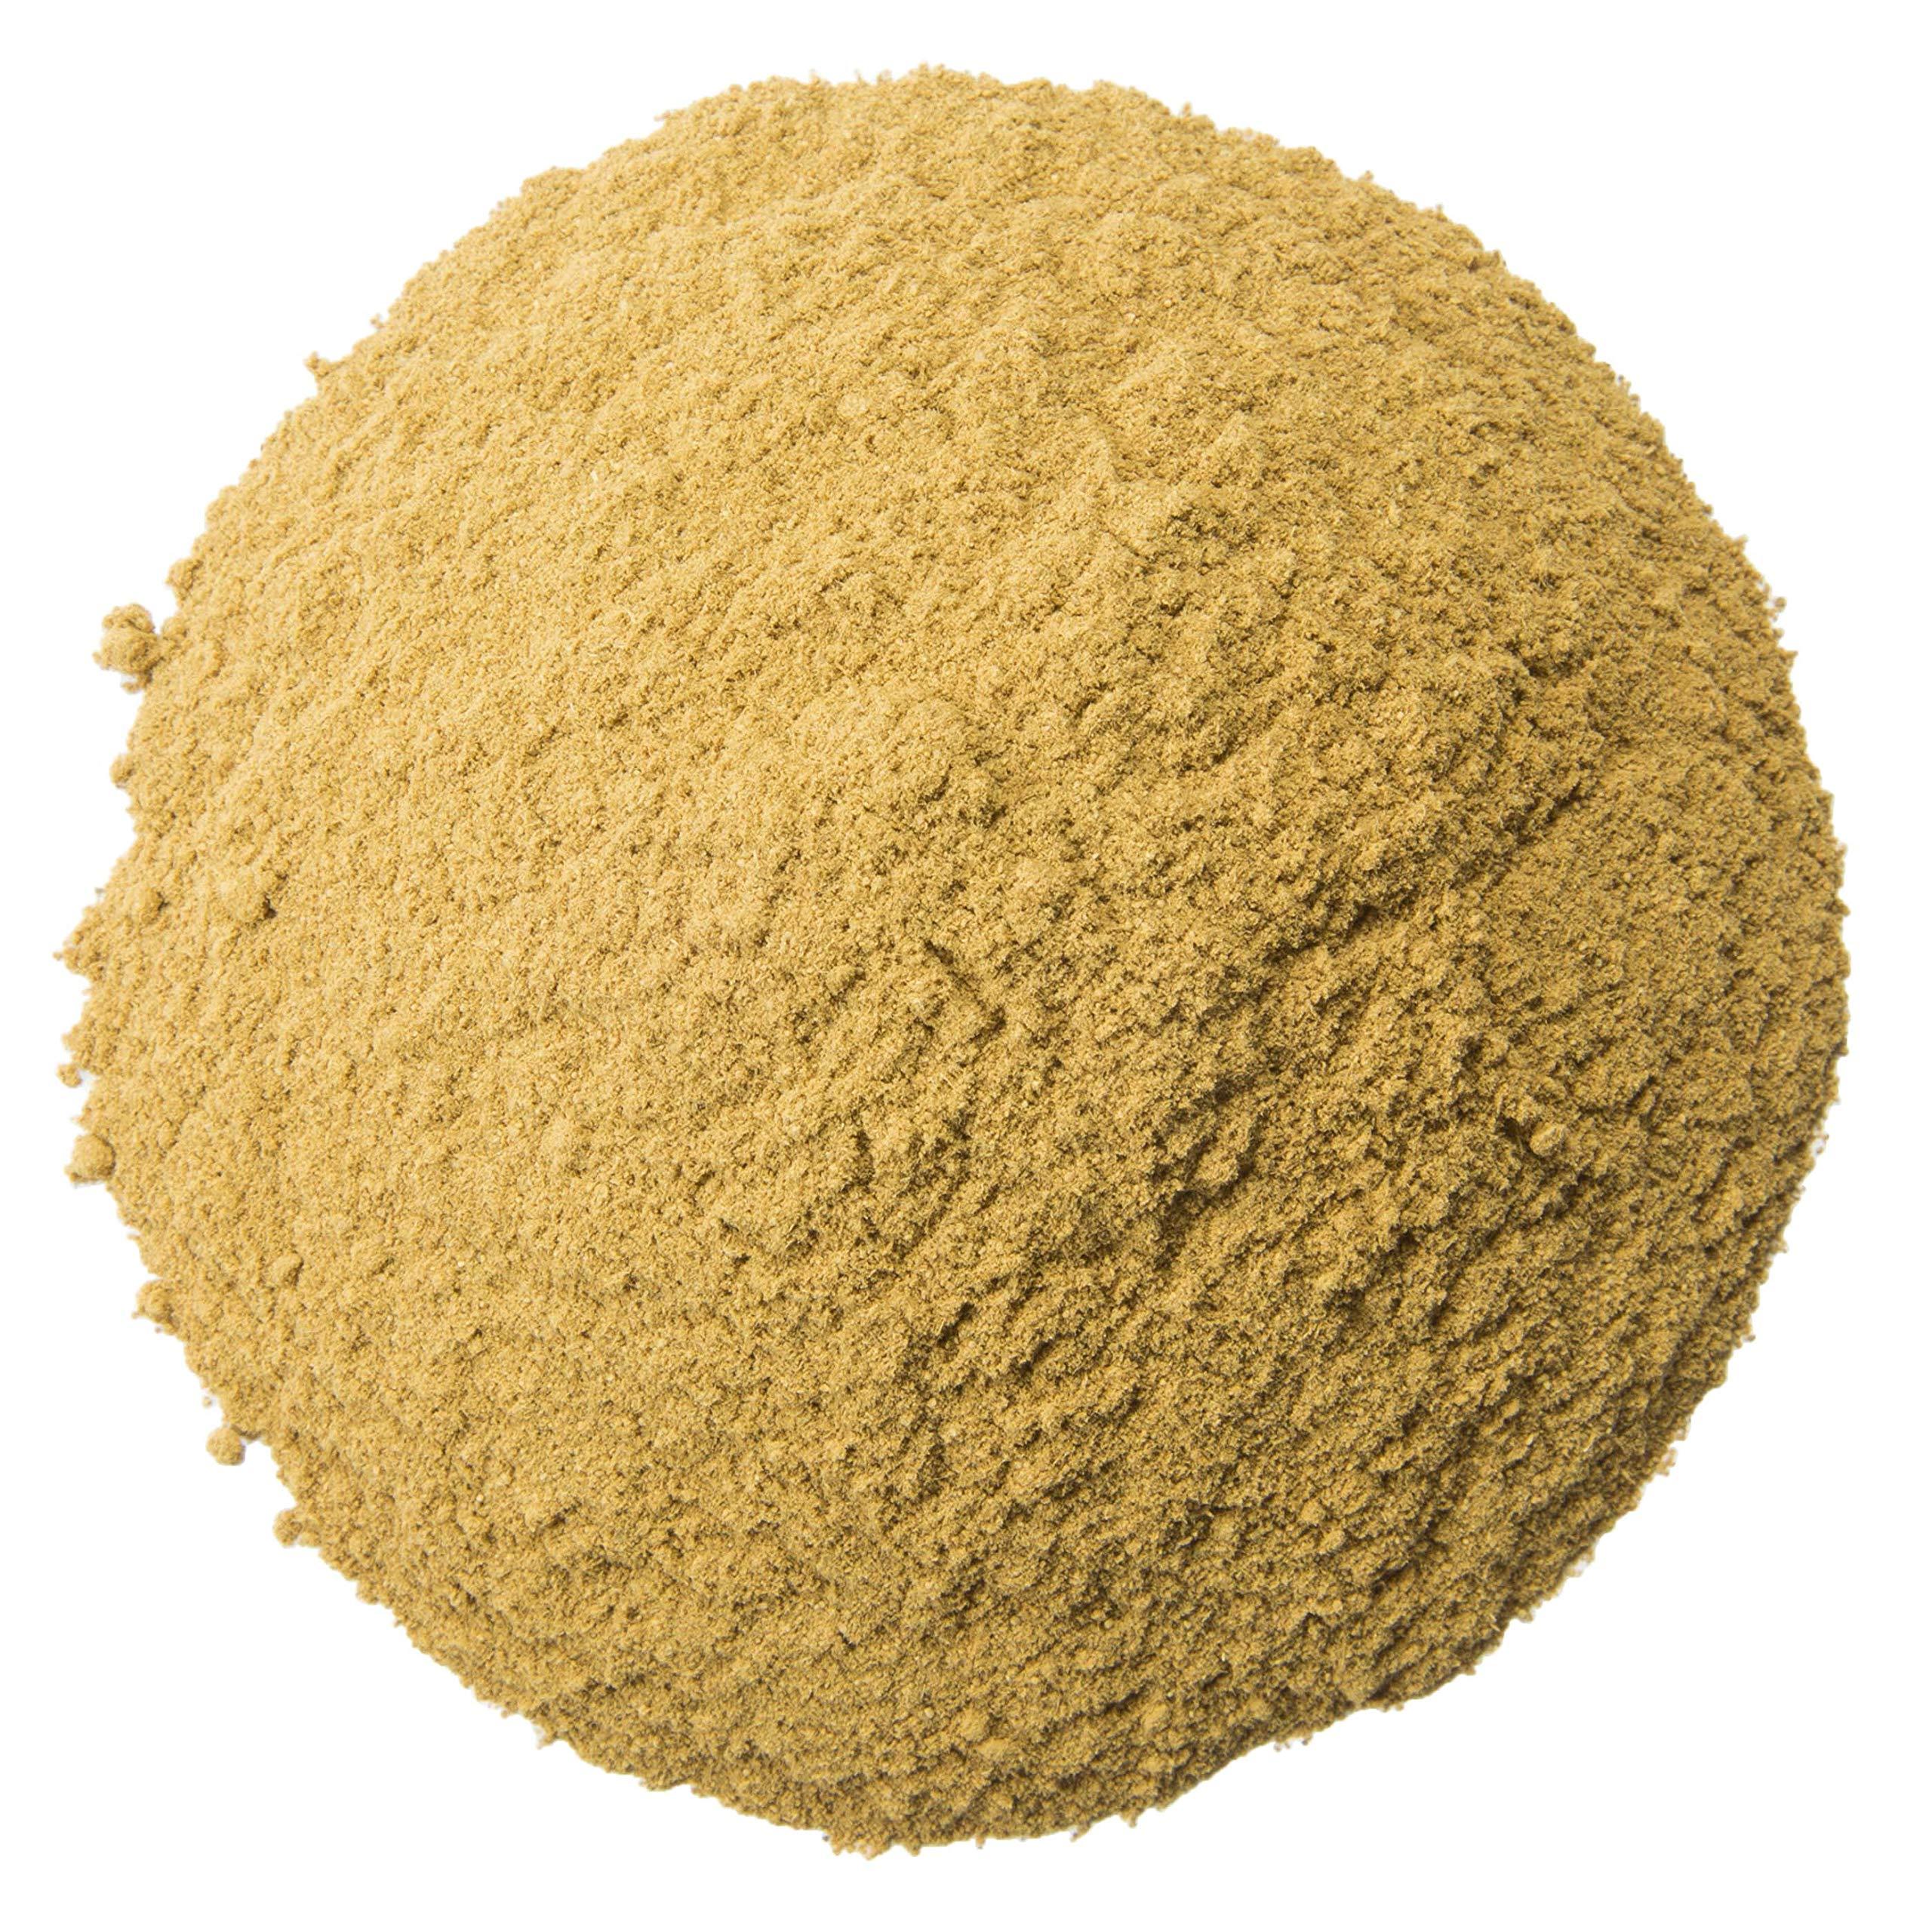 Ground Ceylon Cinnamon | Very freshly ground | Highest Premium Grade | 100% Pure with no additives | Kosher Certified (28oz) by Burma Spice (Image #3)